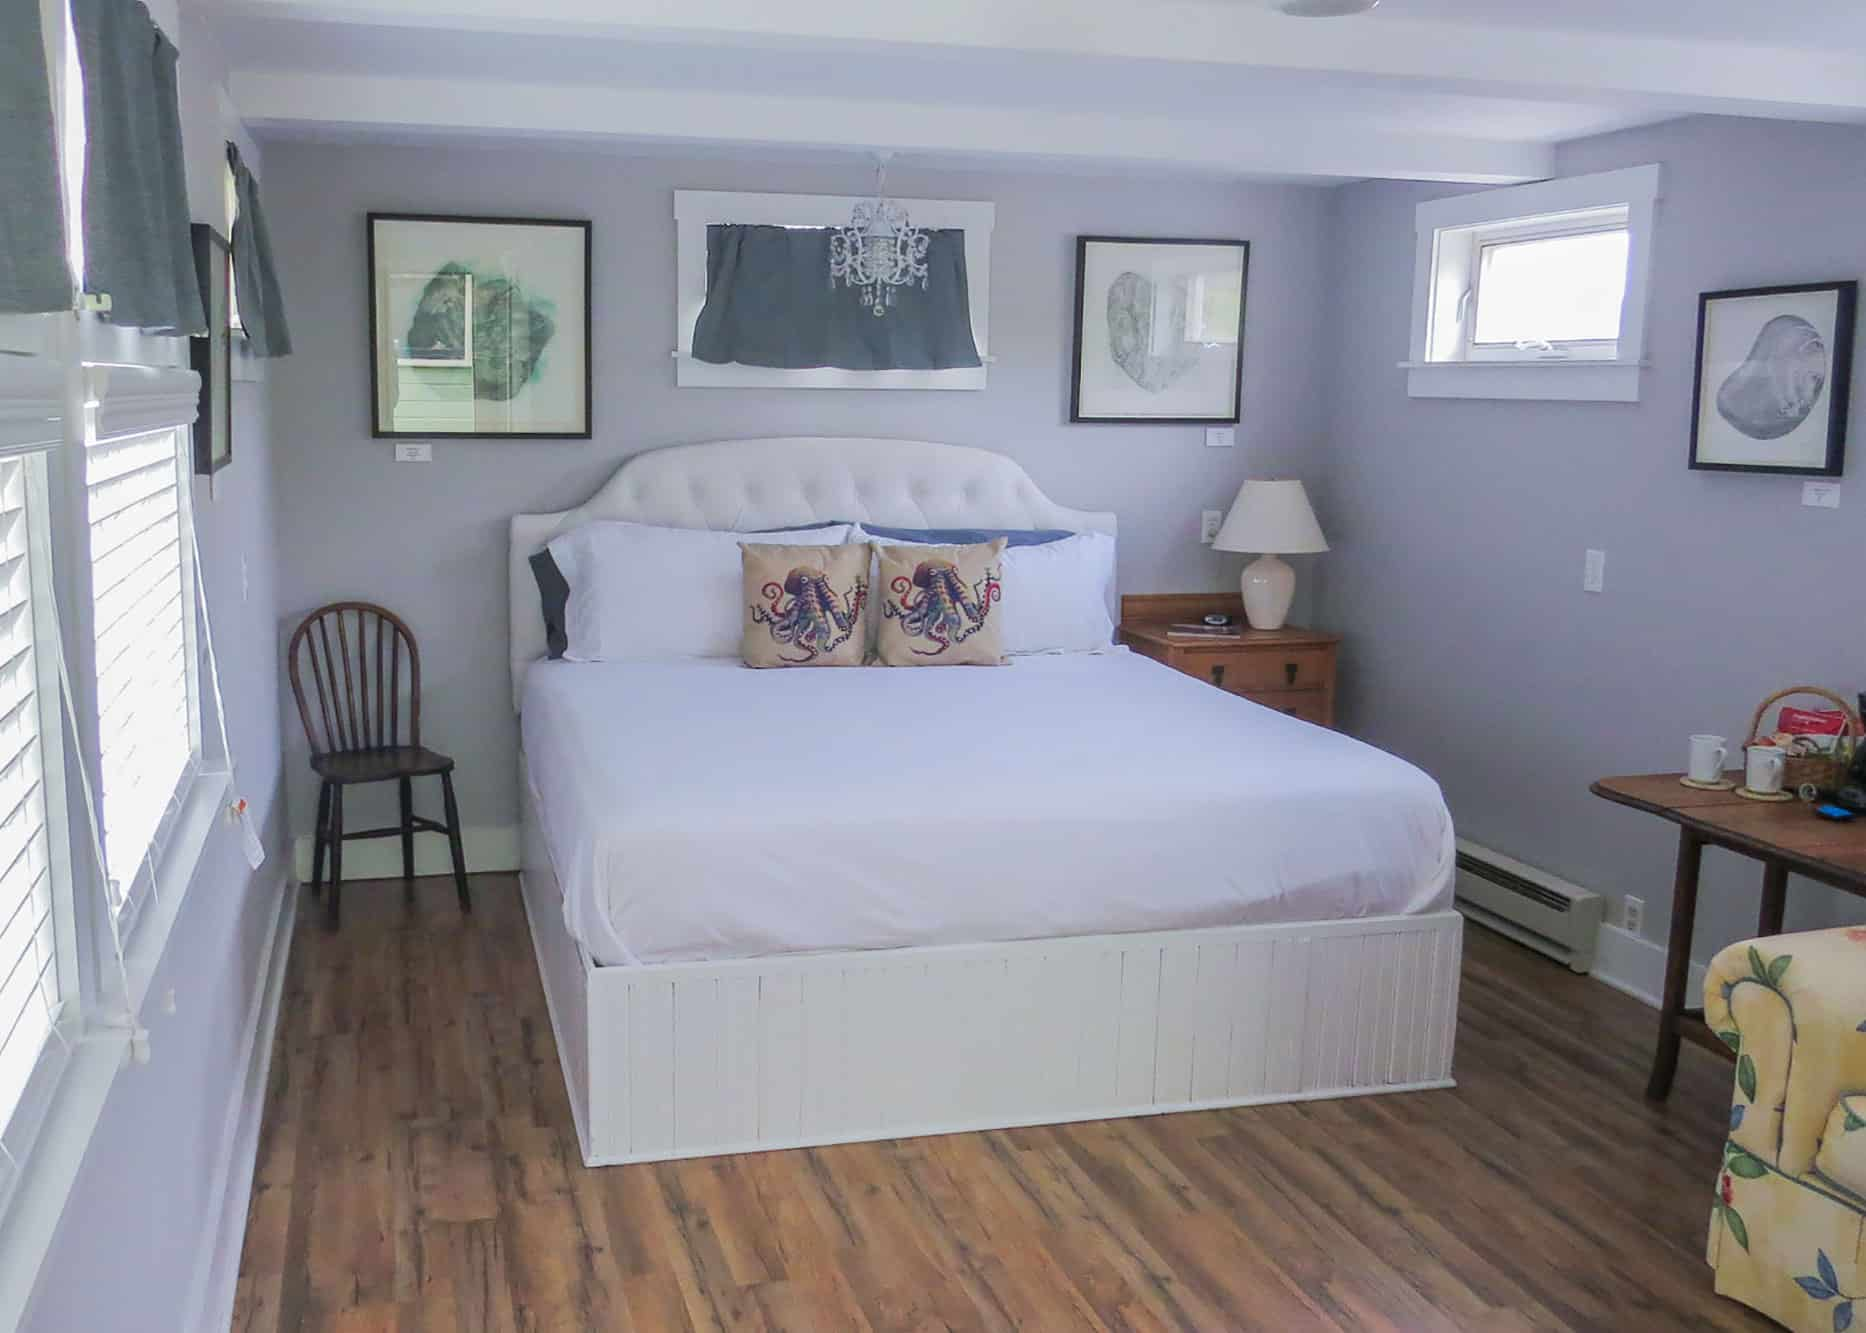 the-edenwild-inn-lopez-island-lodging-2020-room-09-05